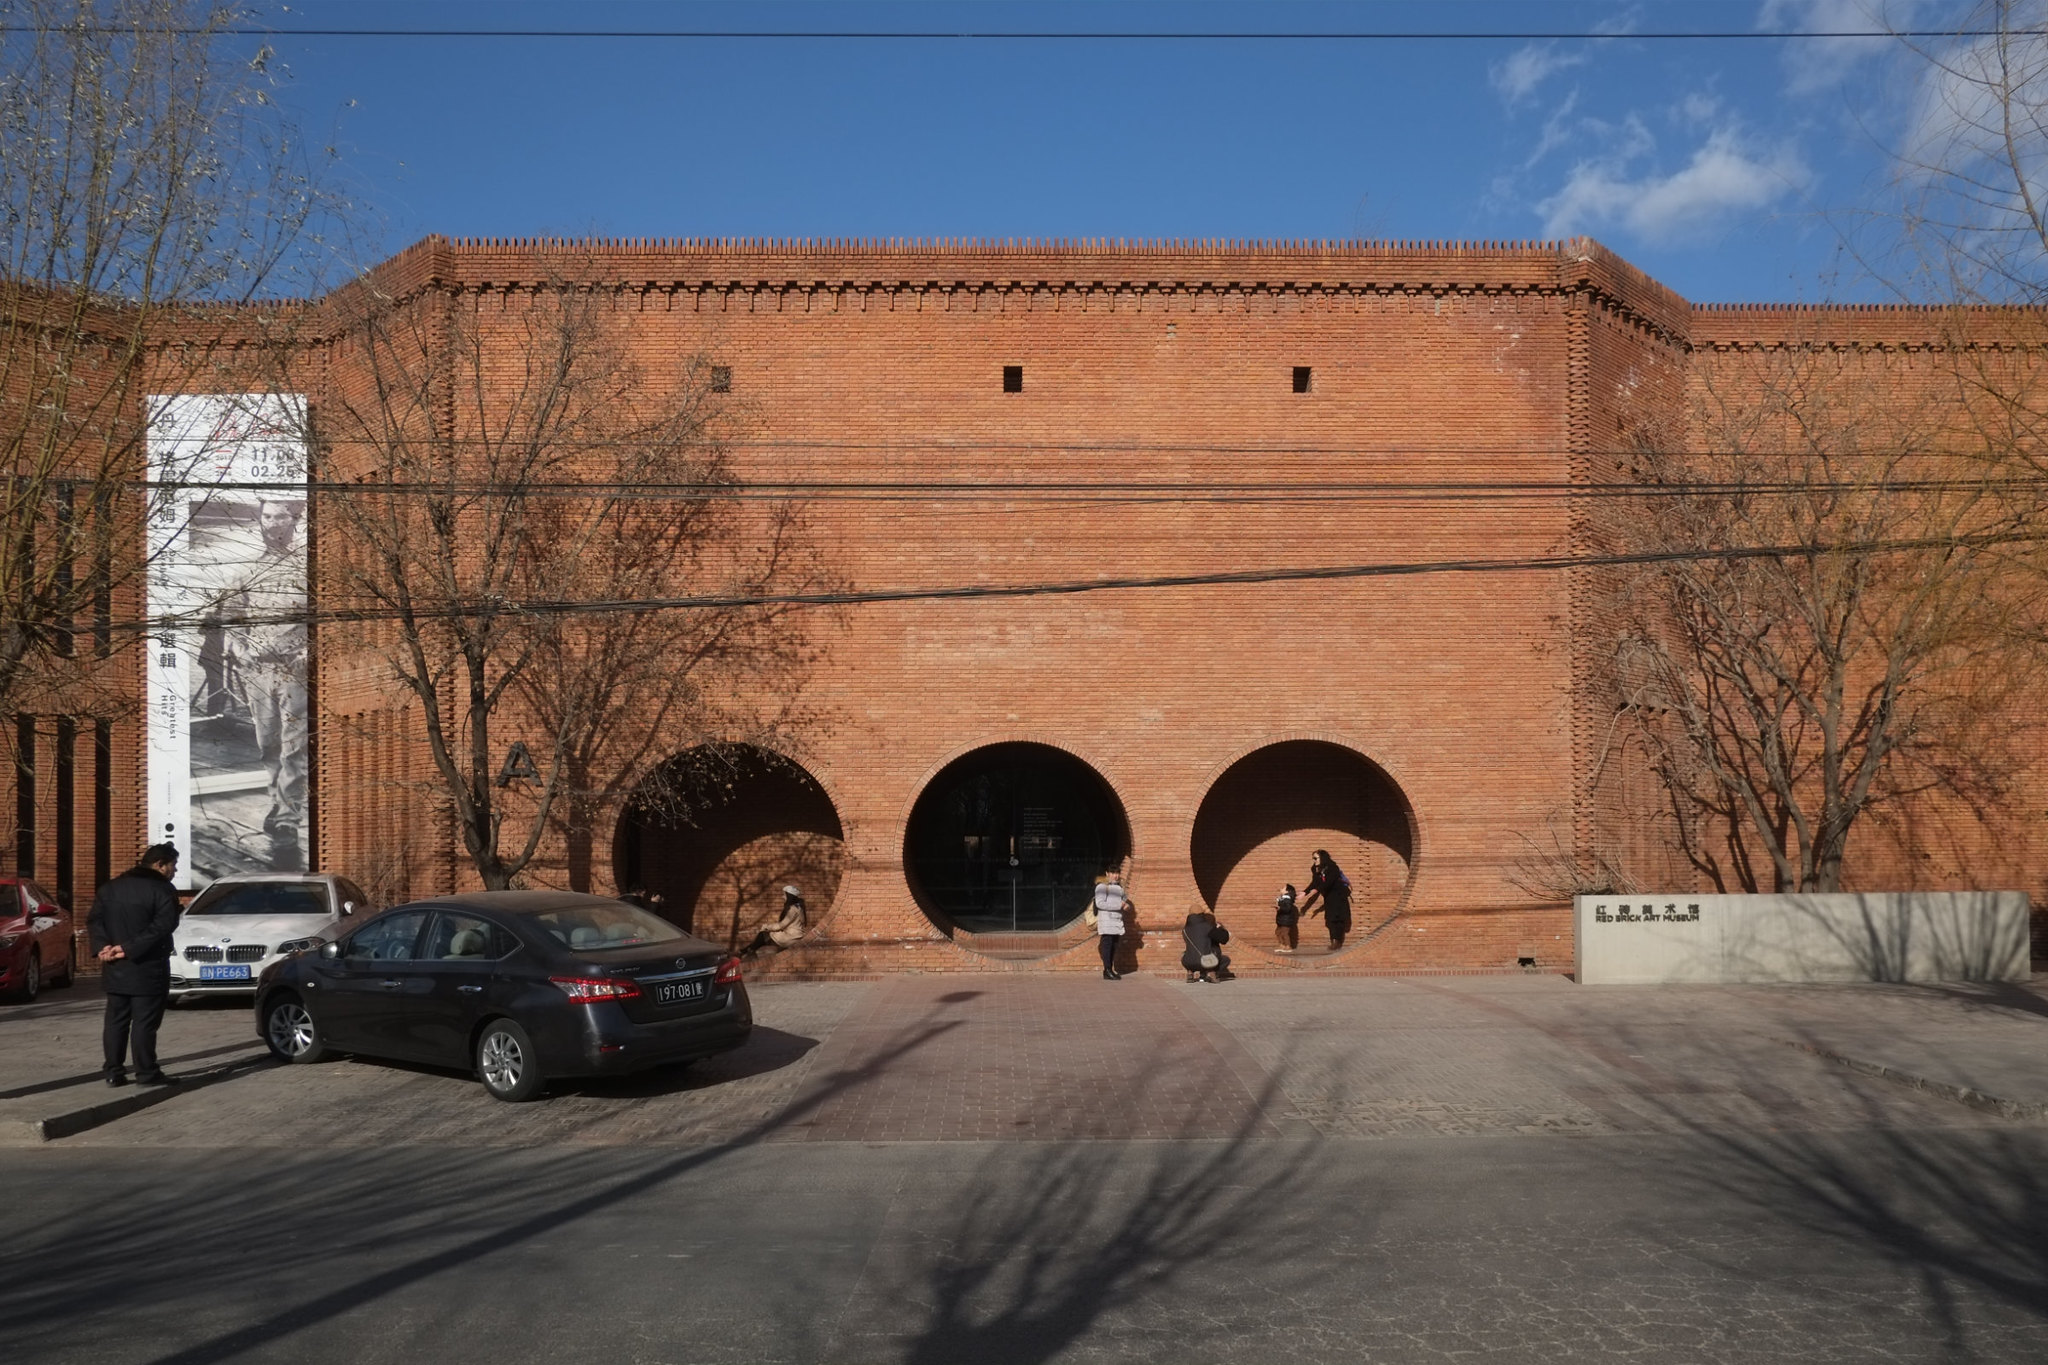 Redbrickmuseum